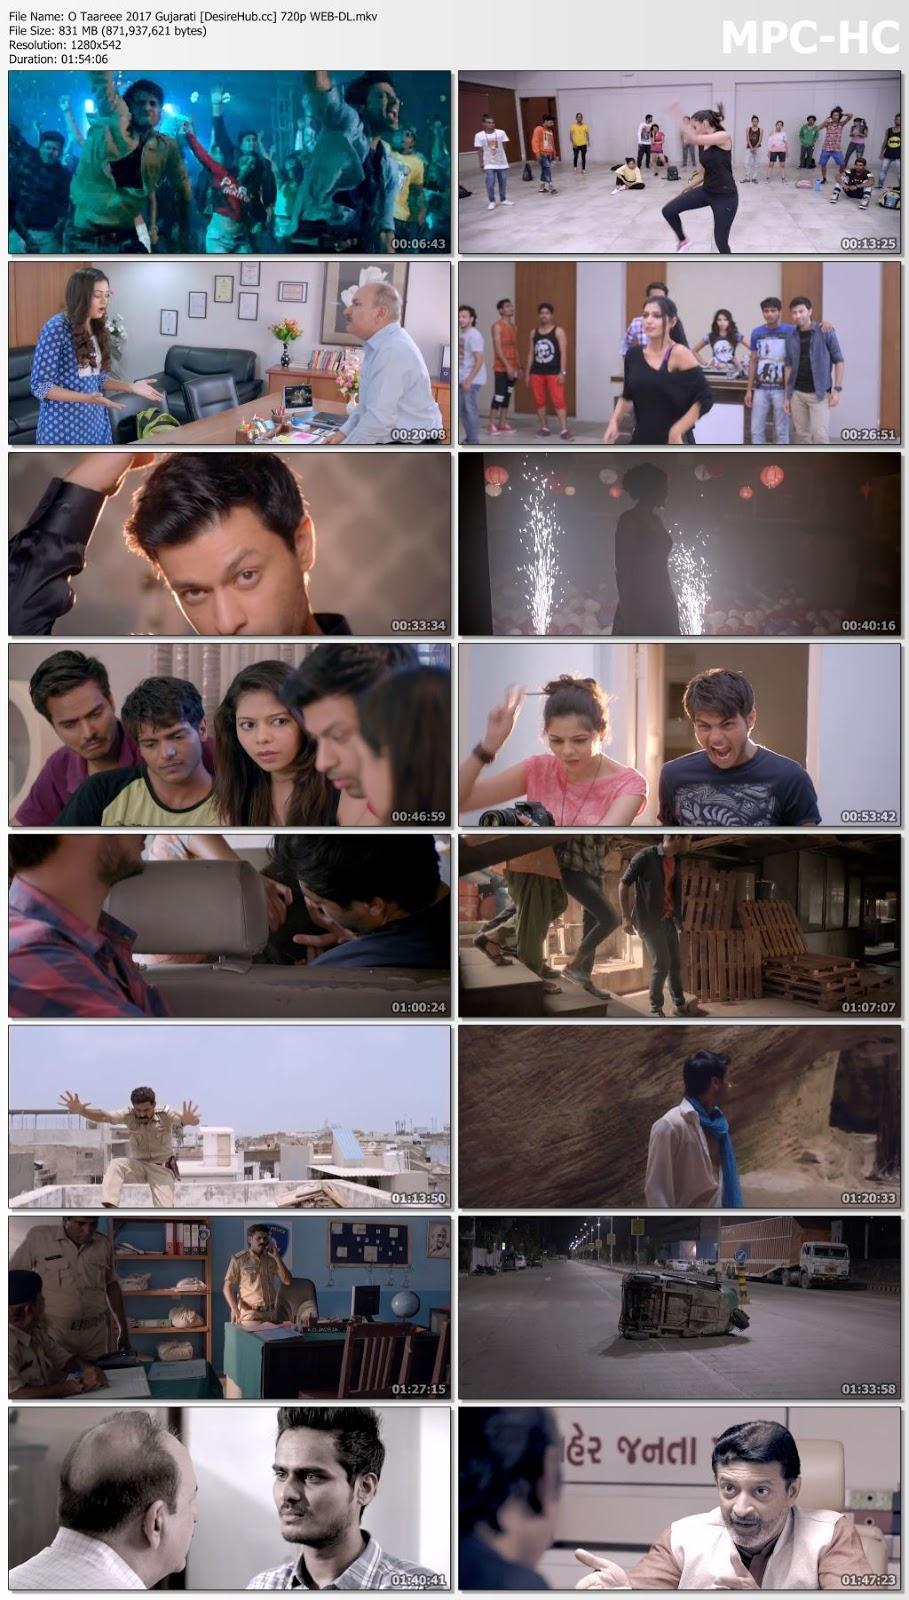 O Taareee 2017 Gujarati 720p WEB-DL 800MB Desirehub